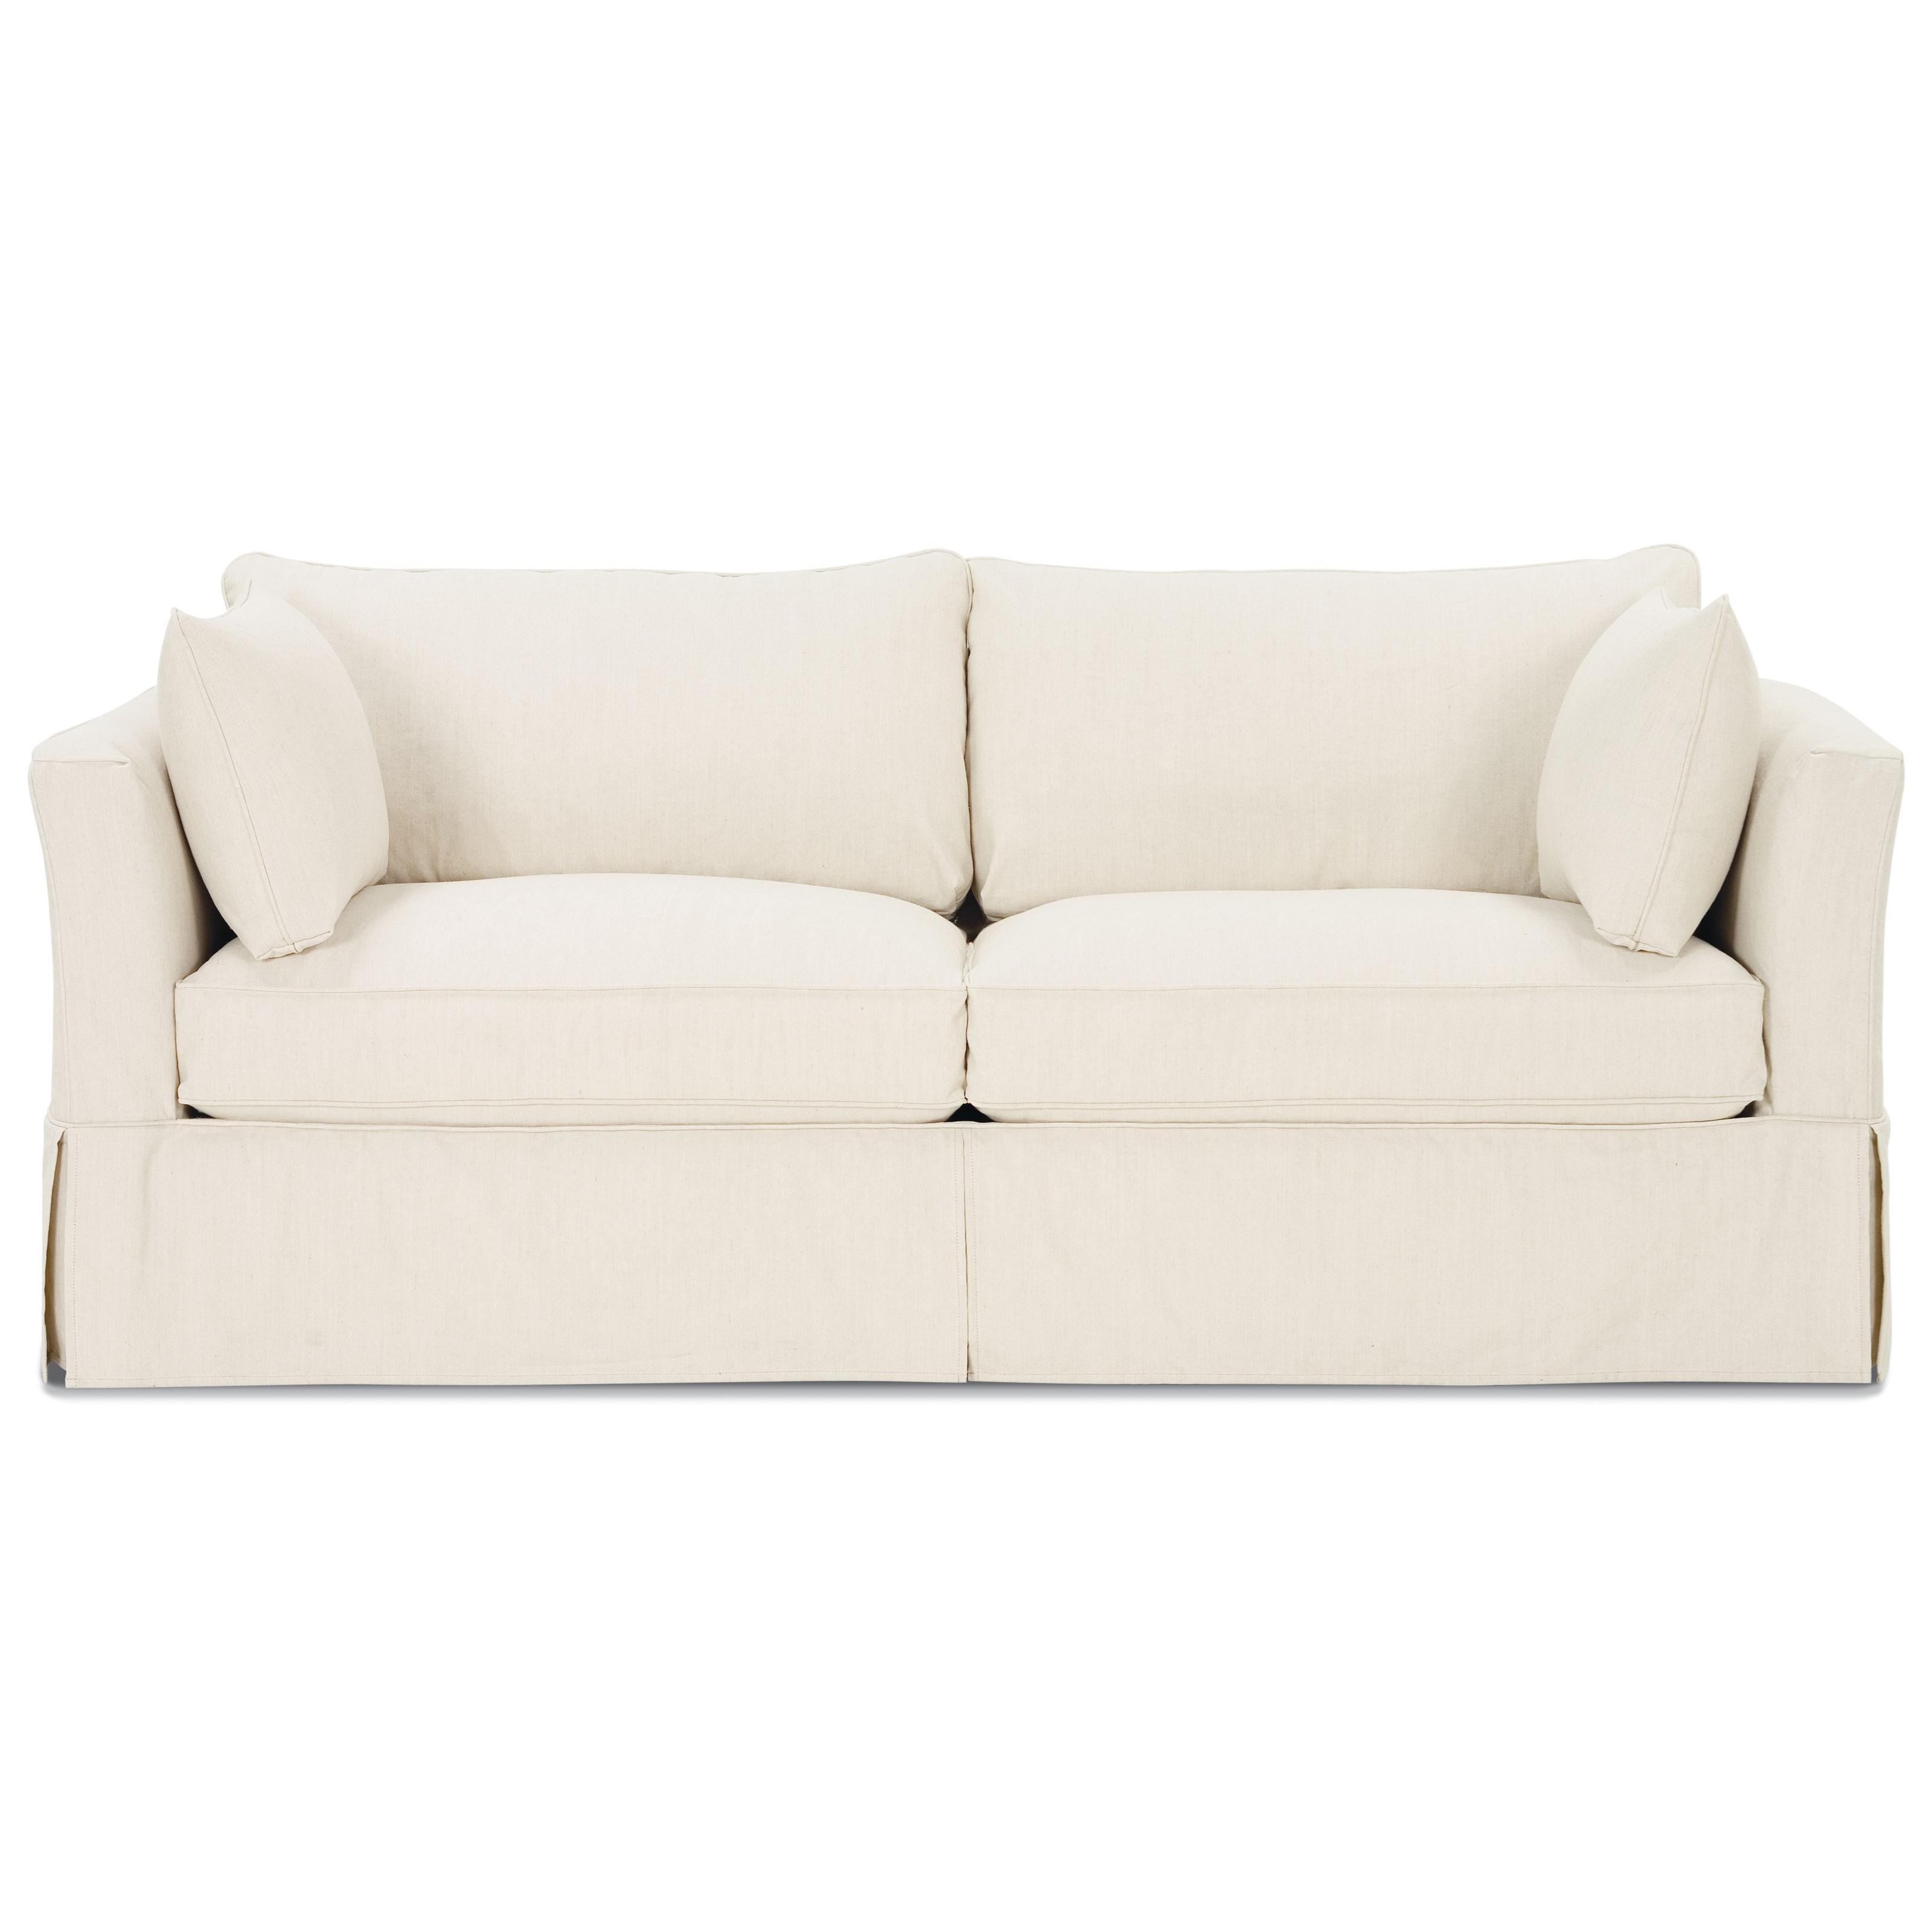 Bon Rowe DarbySlipcover Sofa